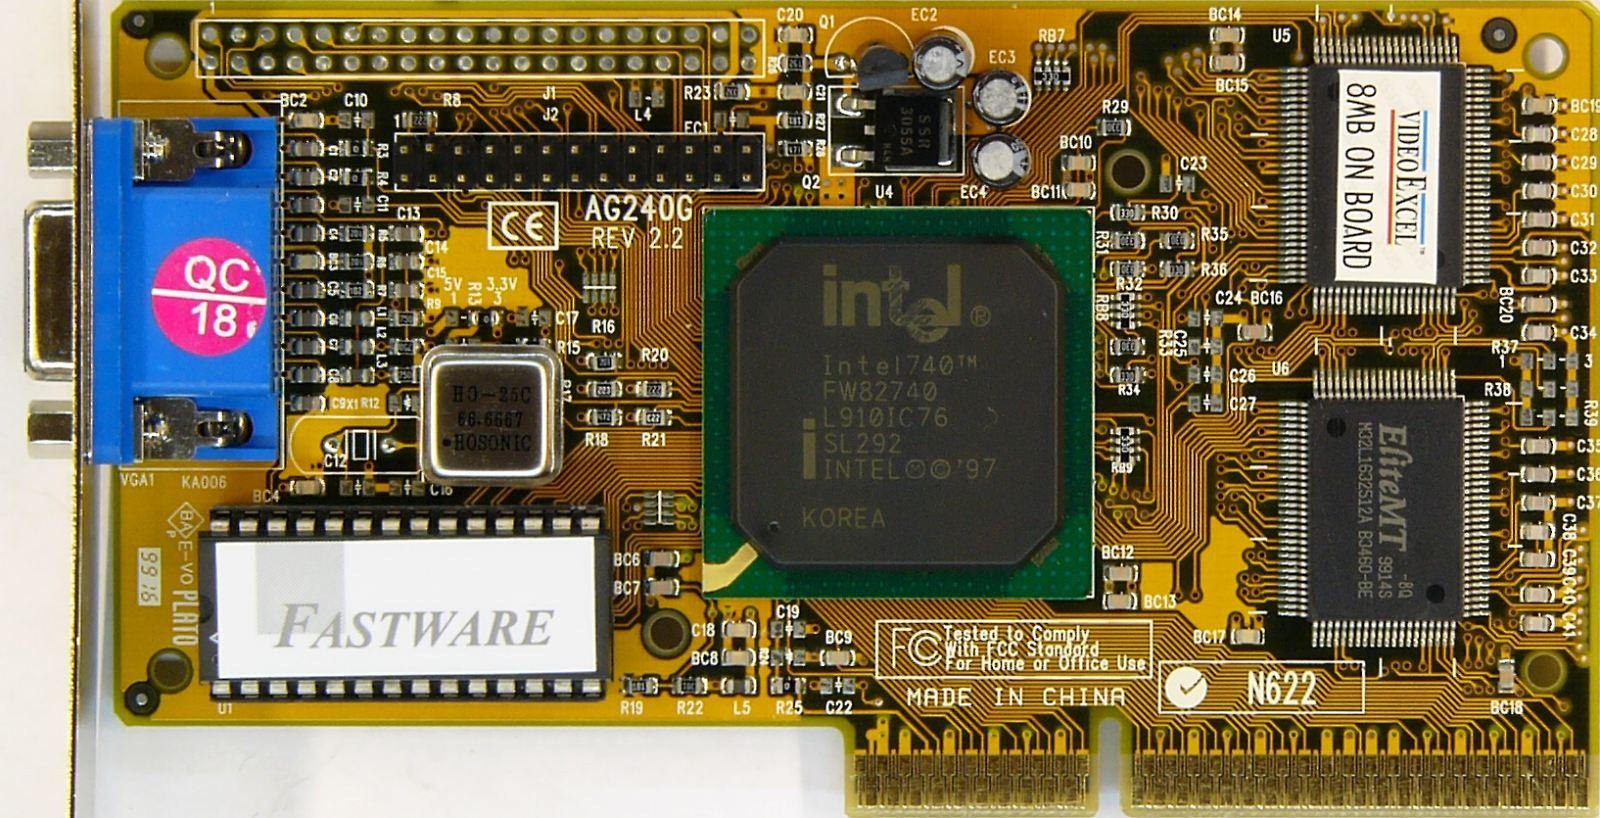 Download fw82801db vga drivers Computers & Internet